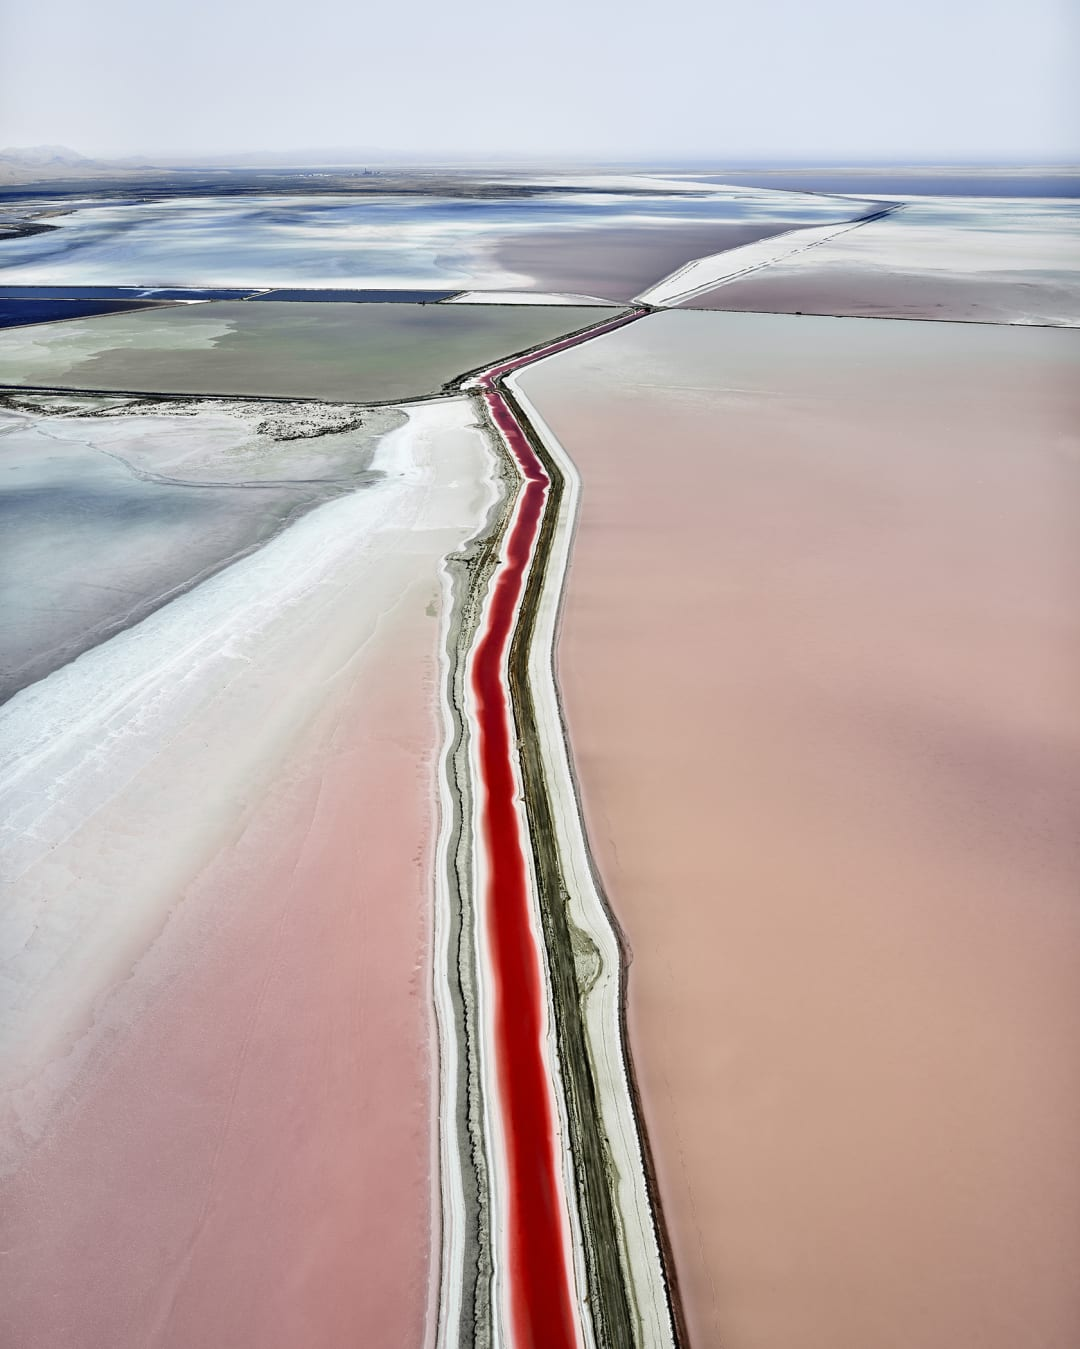 'Parralex, Great Salt Lake, UT, 2017' - David Burdeny